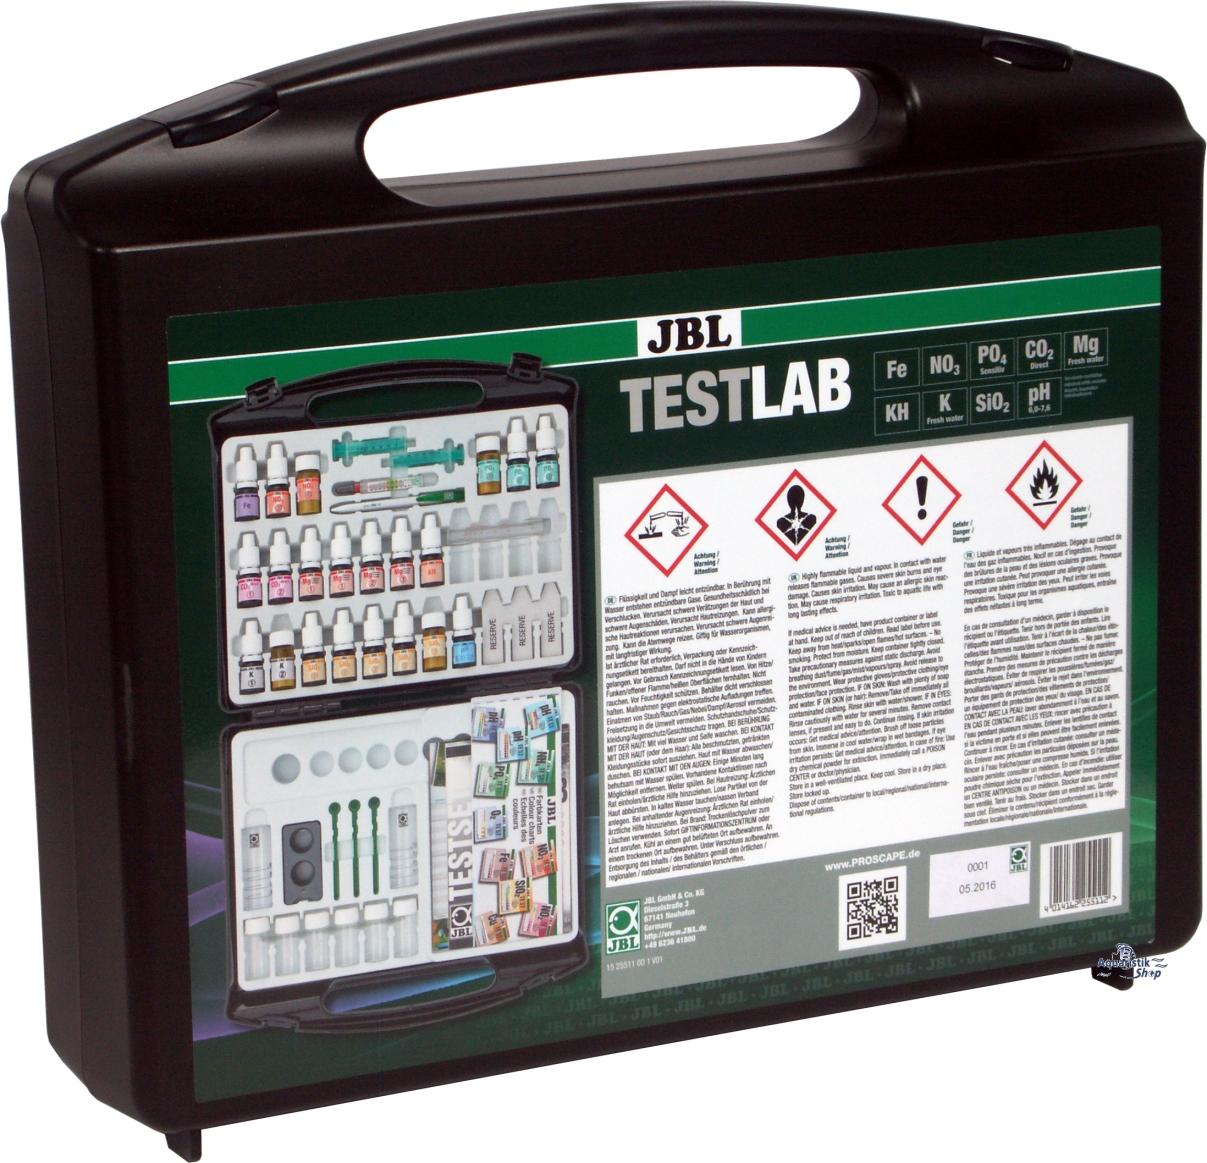 Preise JBL Testlab ProScape